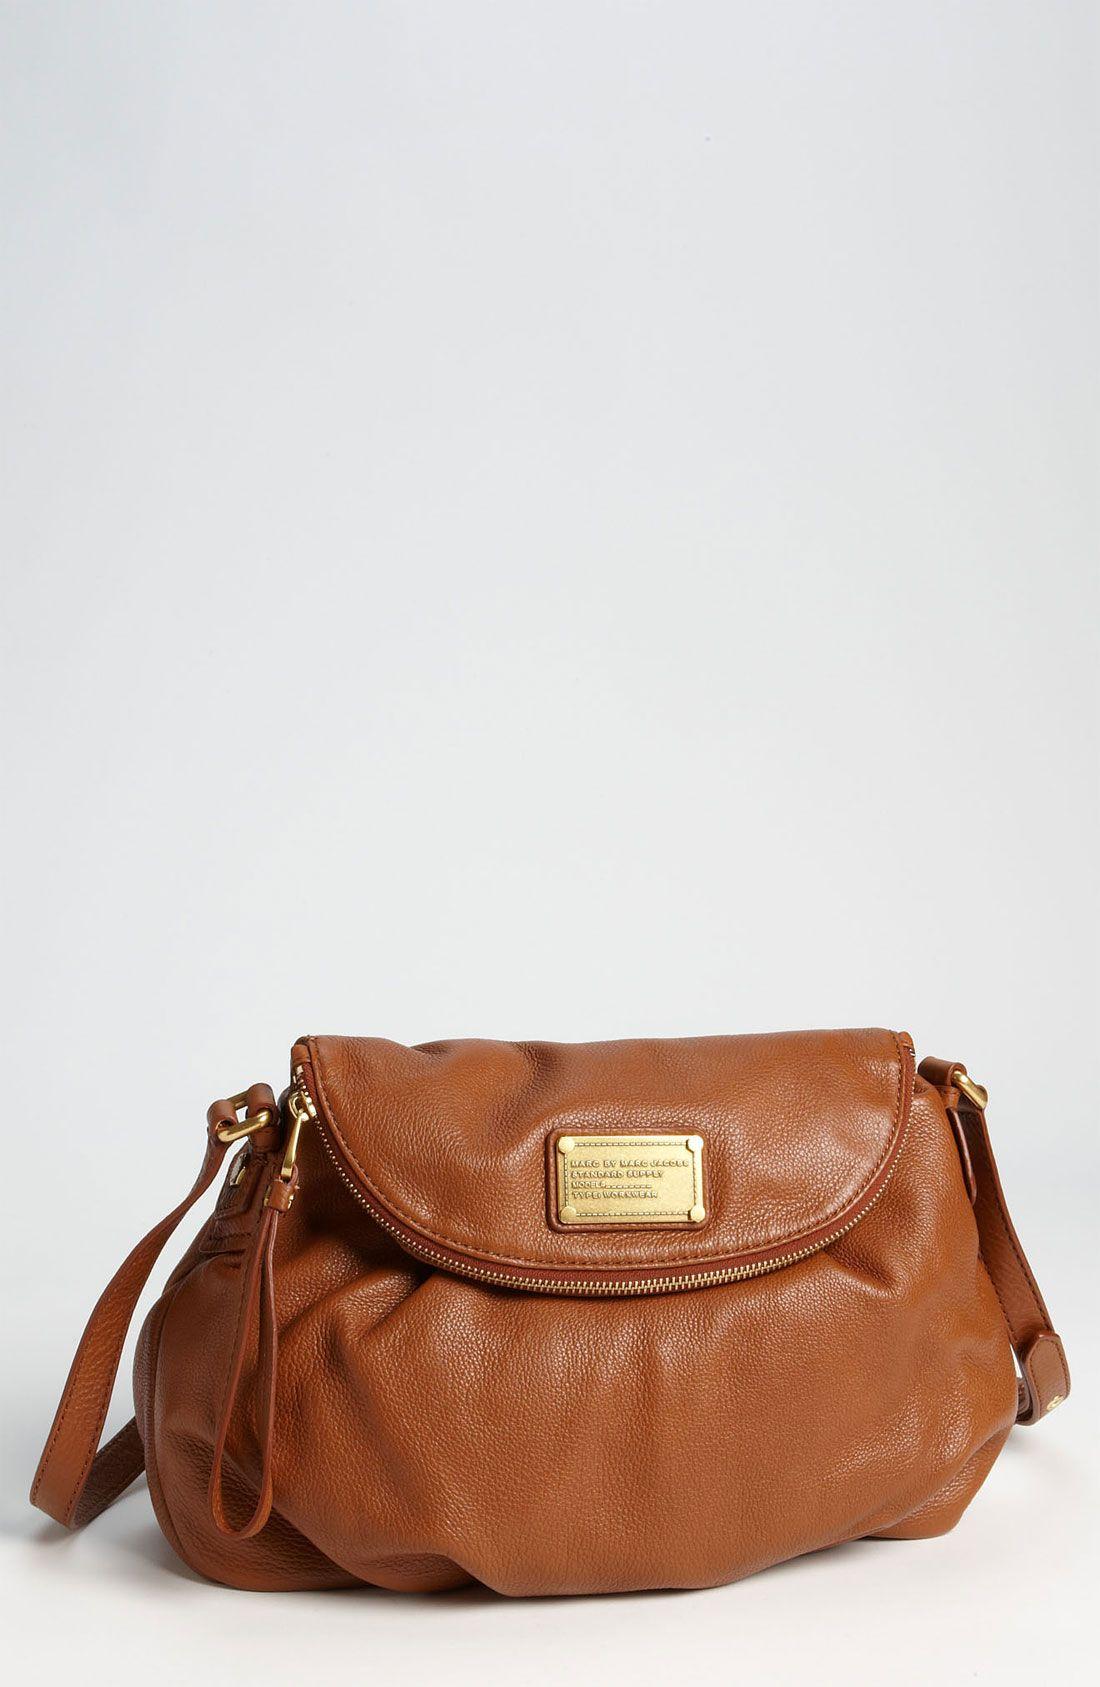 6271c1c1b2c6 Marc By Marc Jacobs Classic Q Natasha Crossbody Flap Bag in Brown (cinnamon  stick)